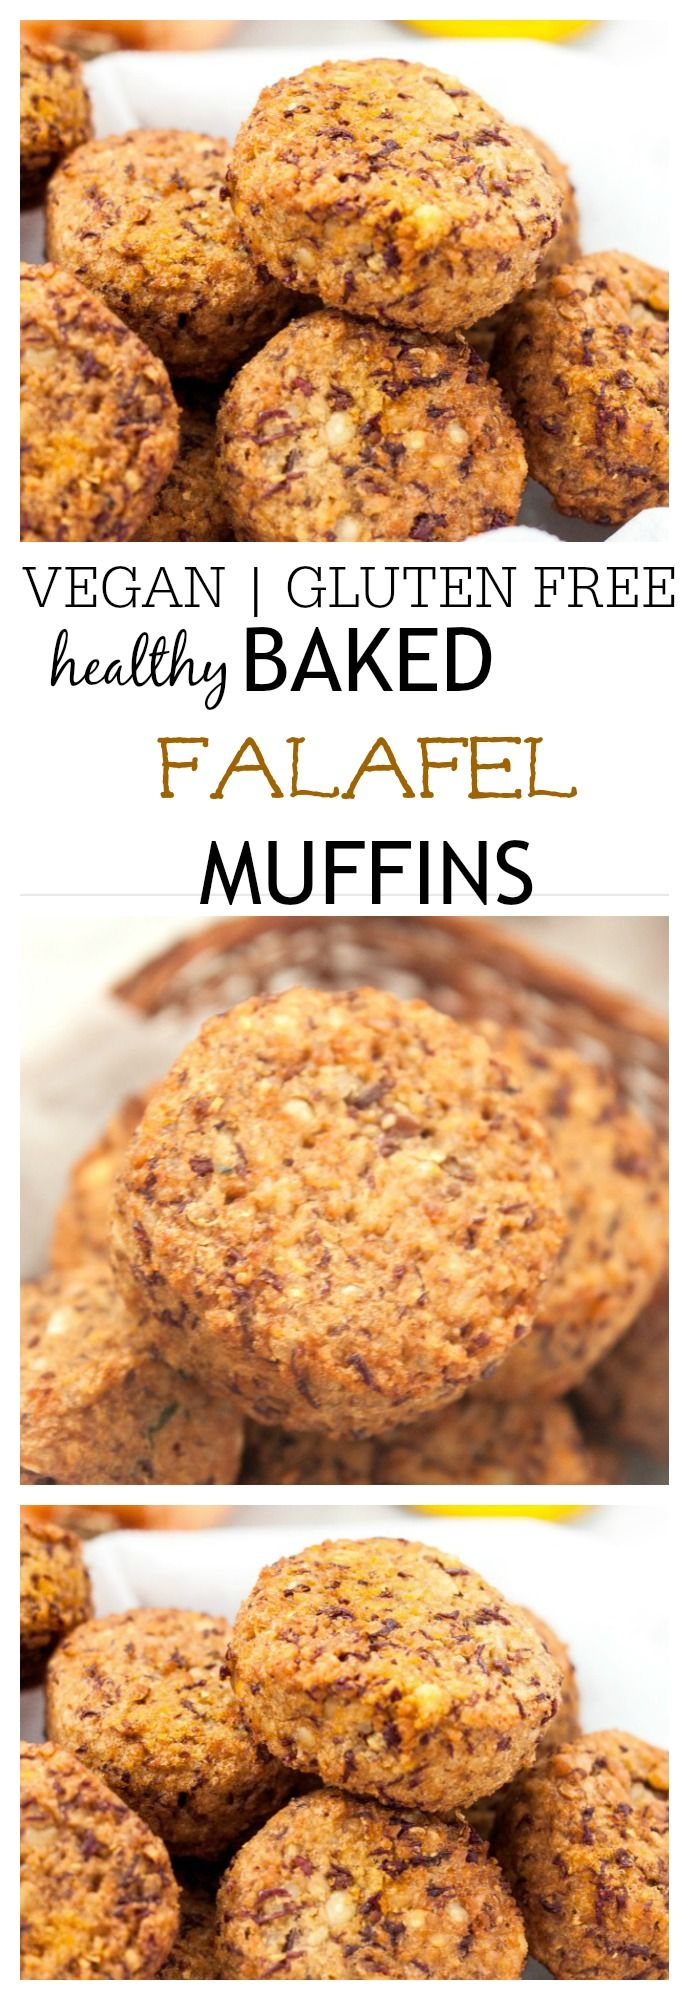 Healthy Baked Falafel Muffins - thebigmansworld.com